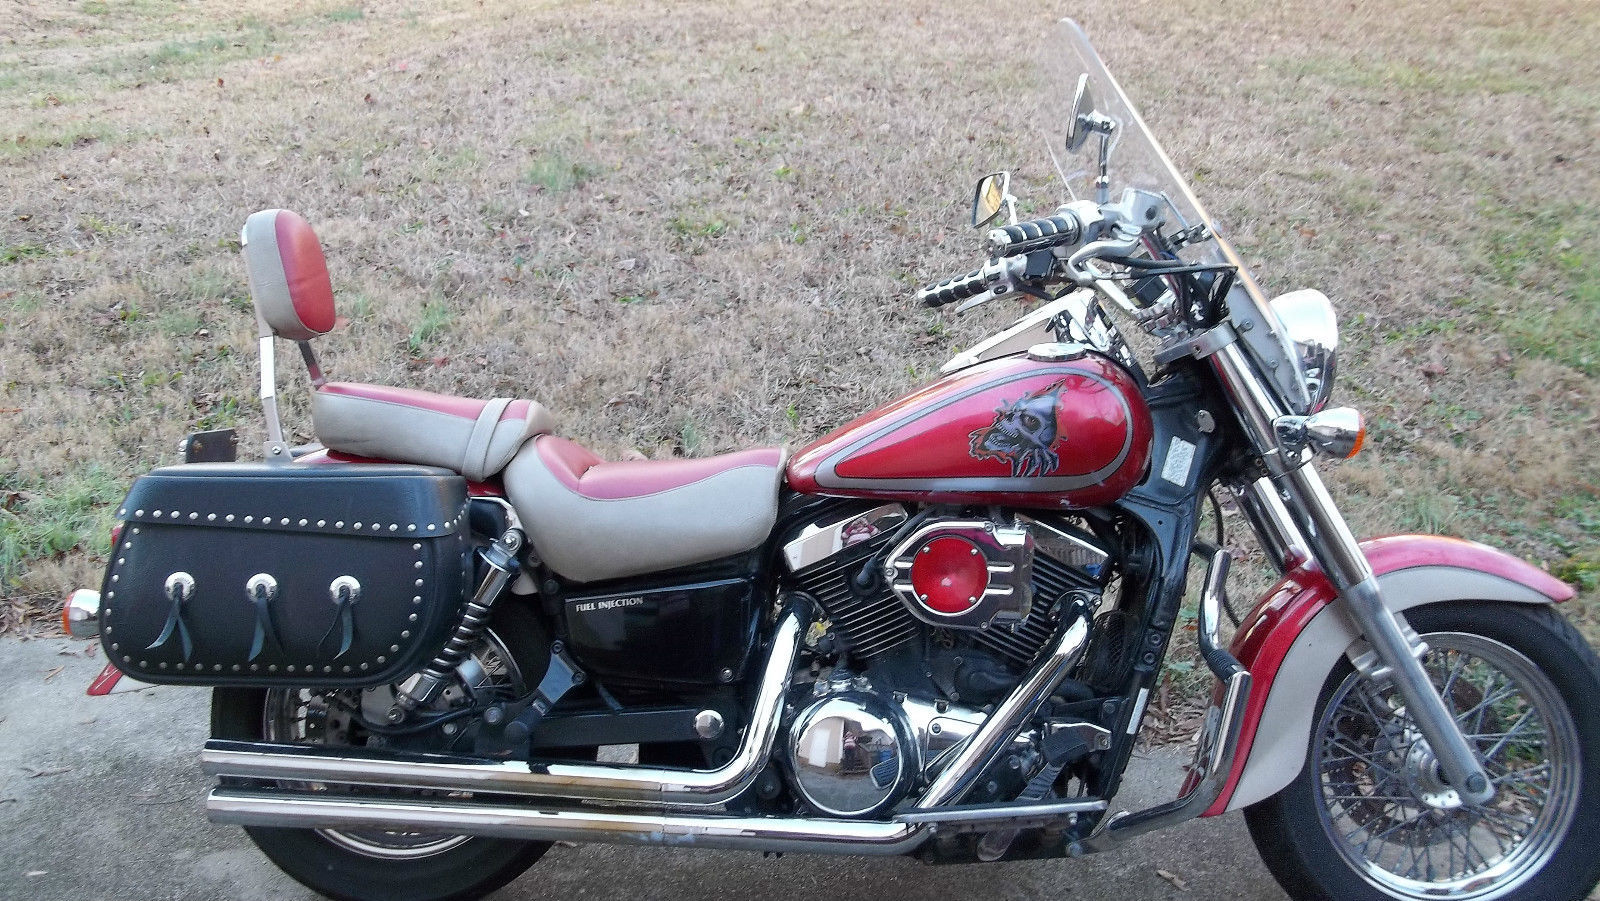 2000 kawasaki vulcan 1500 classic carburetor